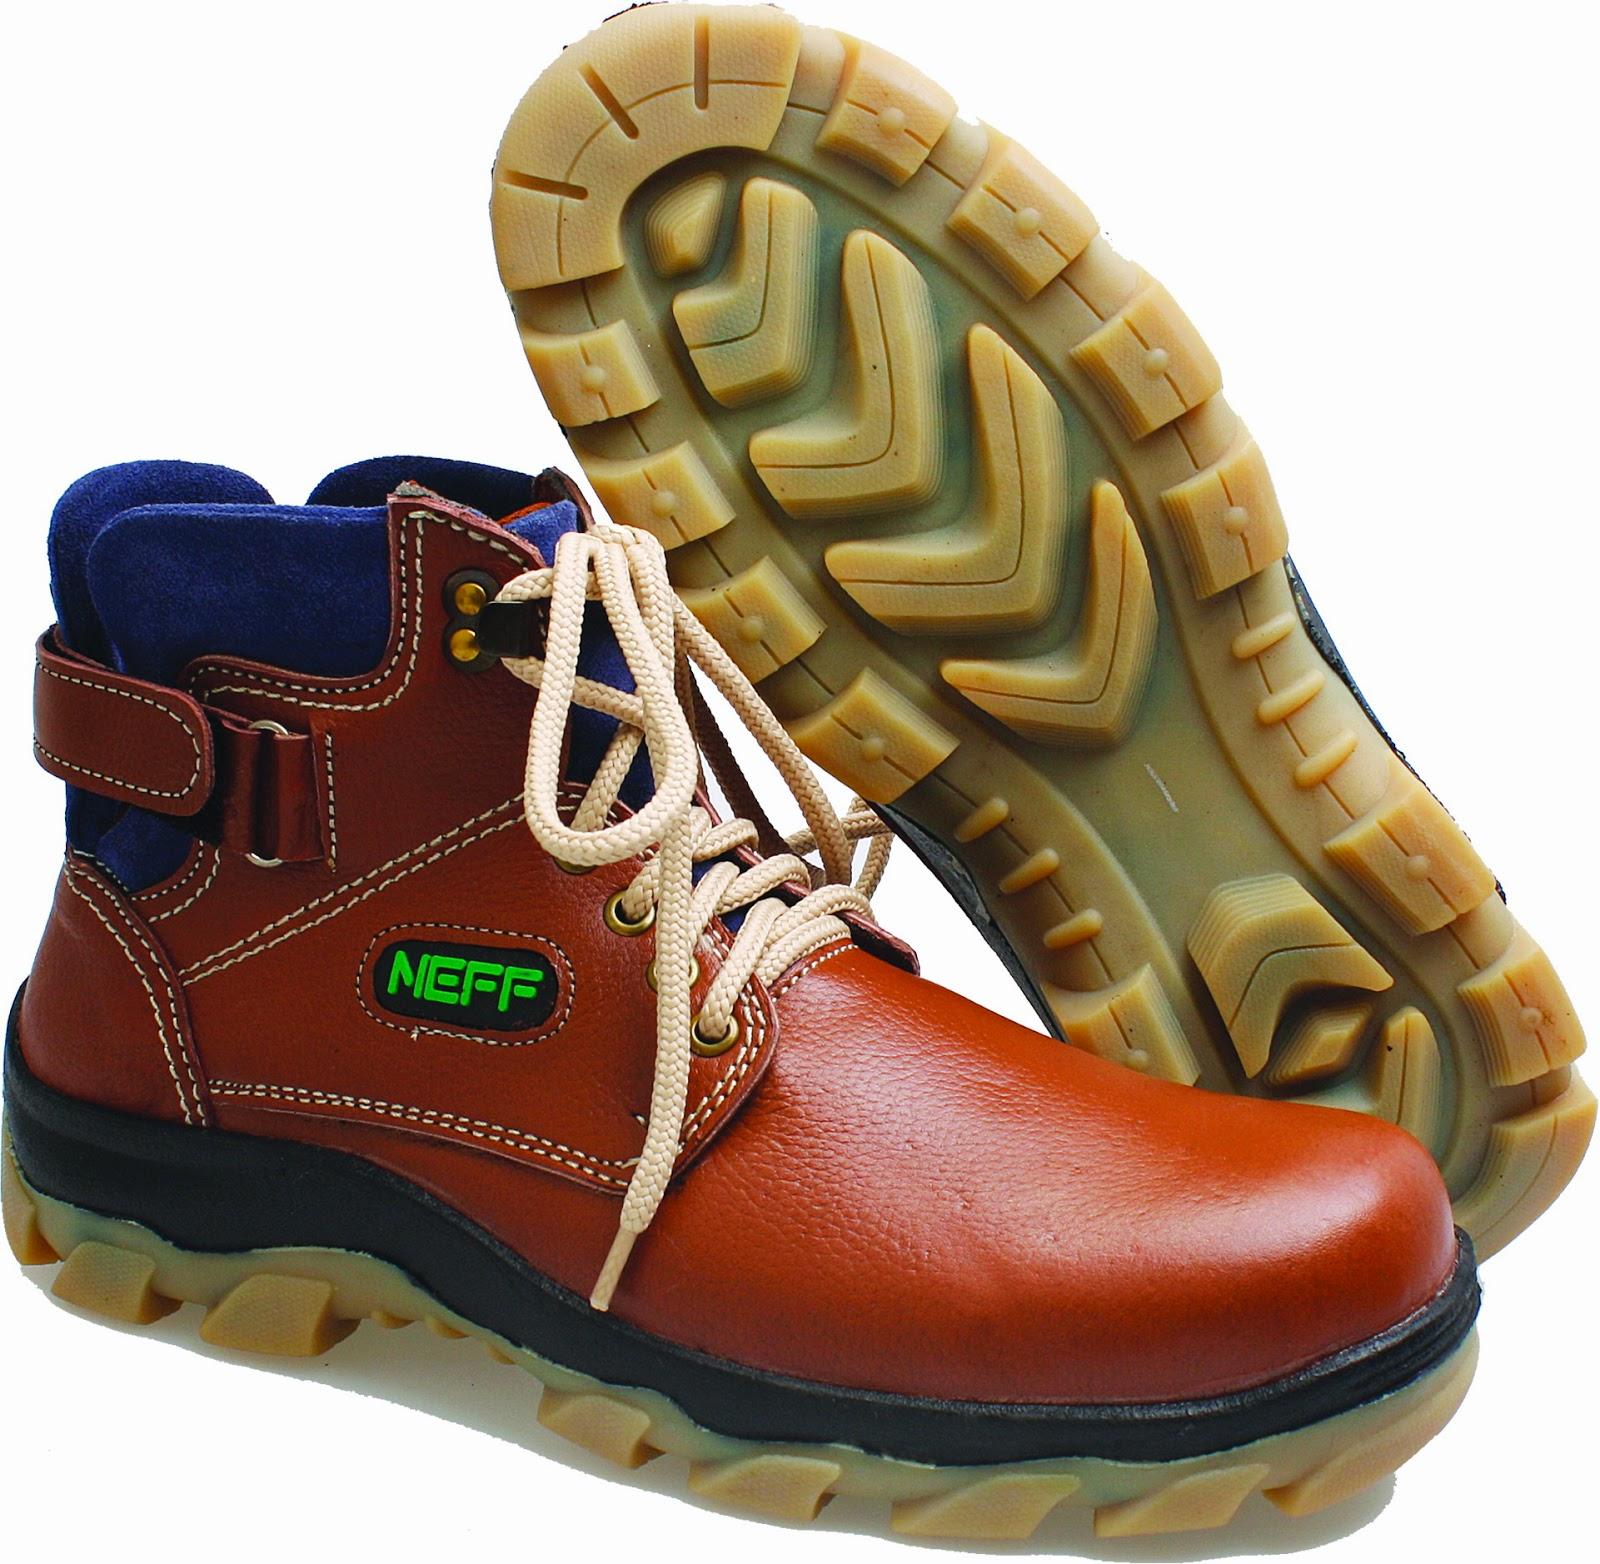 Sepatu Gunung Cibaduyut, Sepatu Cibaduyut Online, Sepatu Gunung Kulit, Grosir Sepatu Gunung Murah